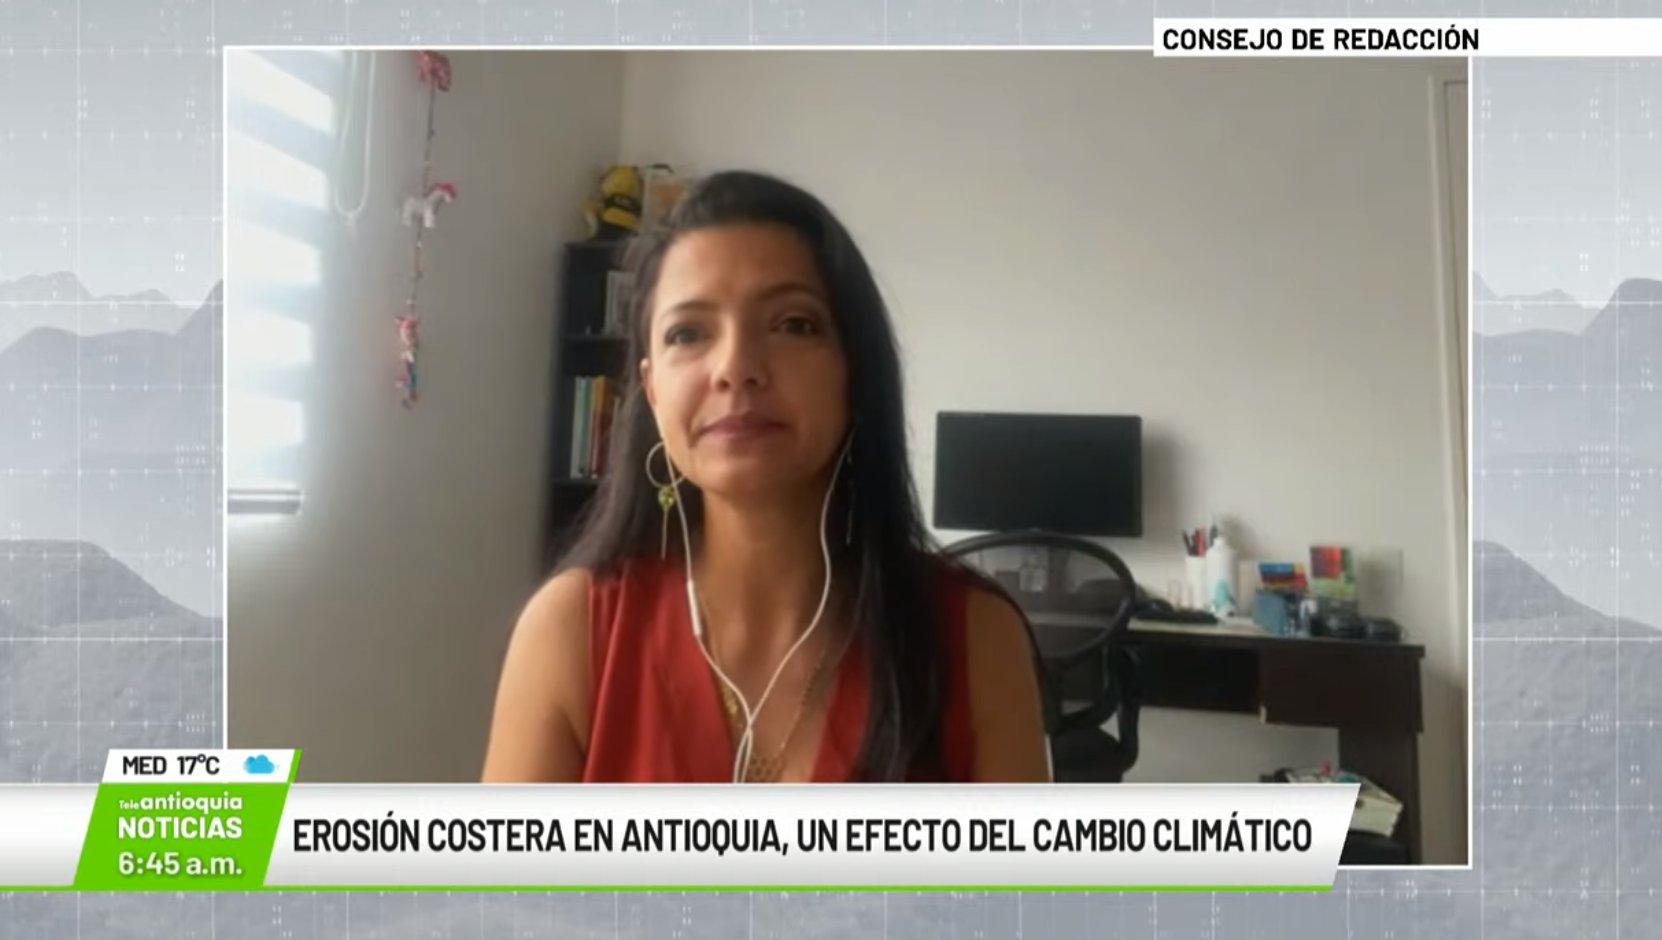 Entrevista con Yuley Cardona Orozco, experta en cambio climático